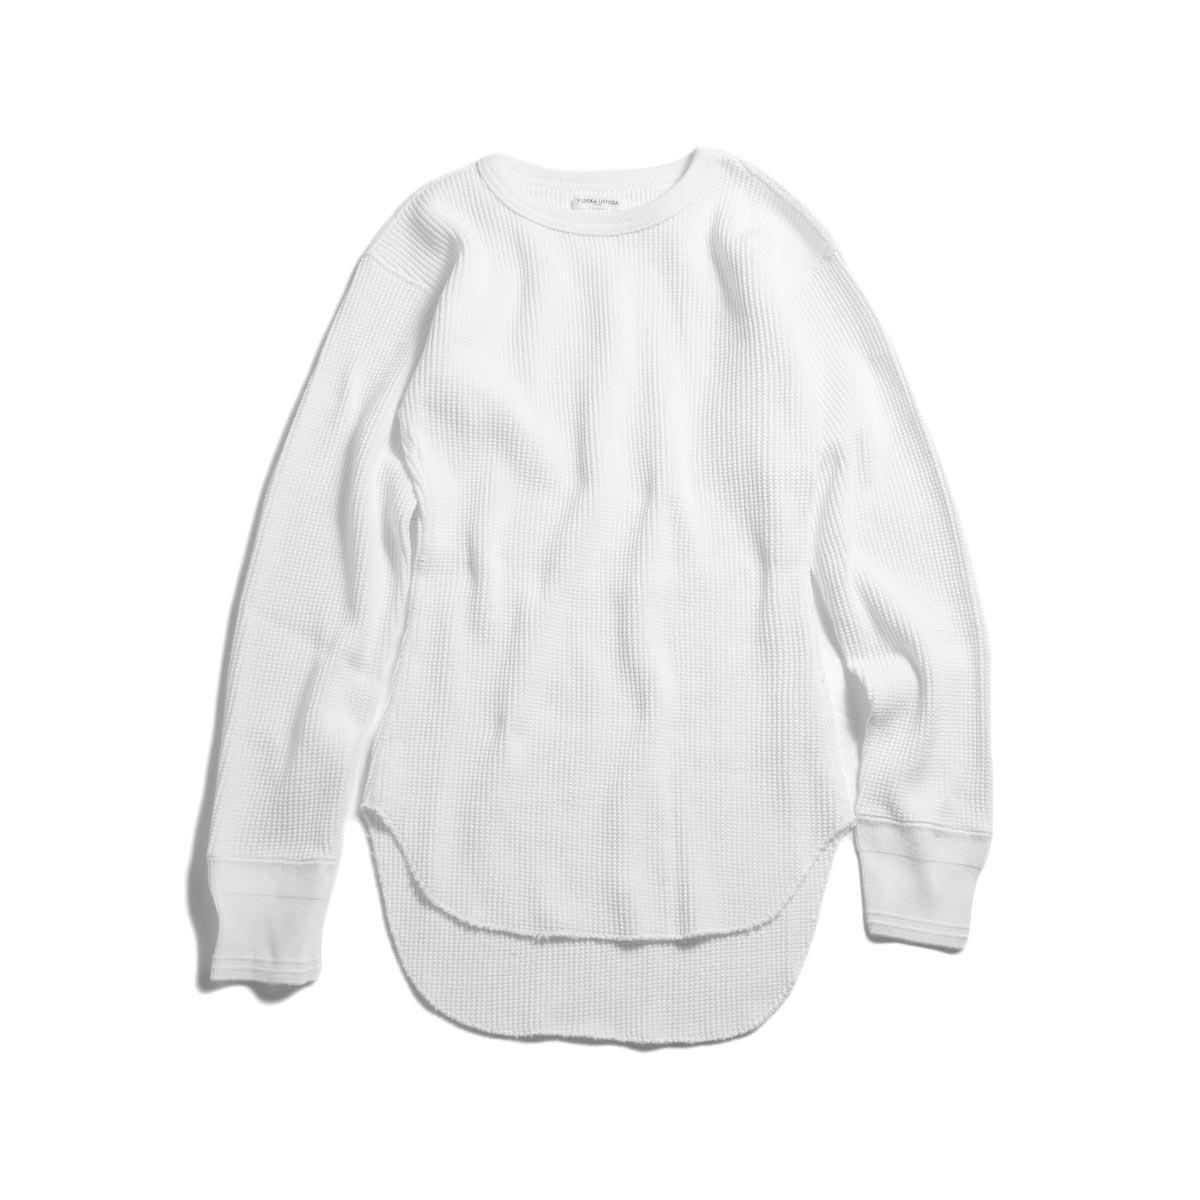 FUMIKA UCHIDA / Cotton Waffle Thermal Top -White